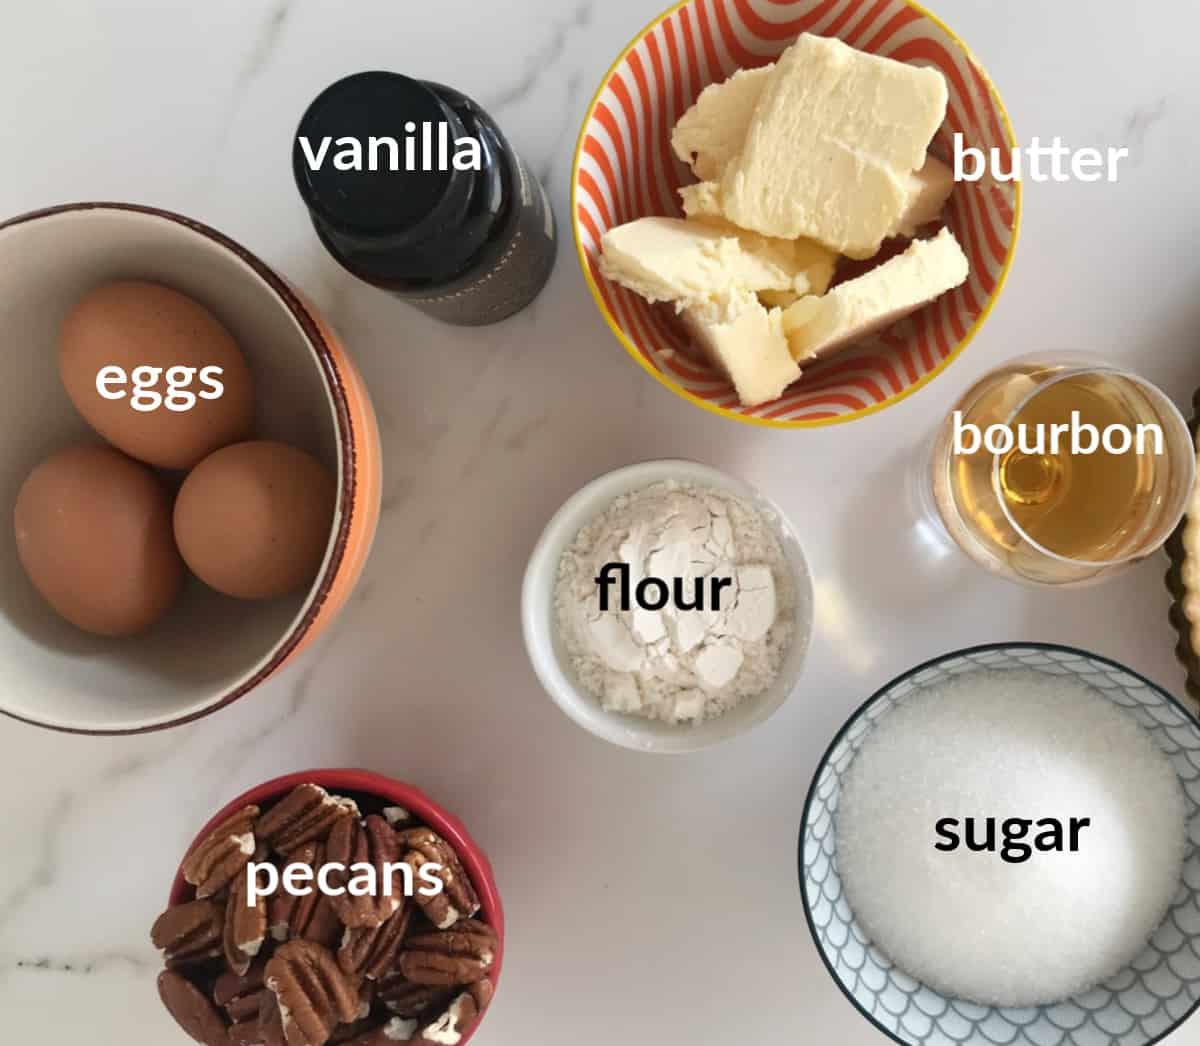 Bourbon Pecan Pie ingredients.in bowl on white surface